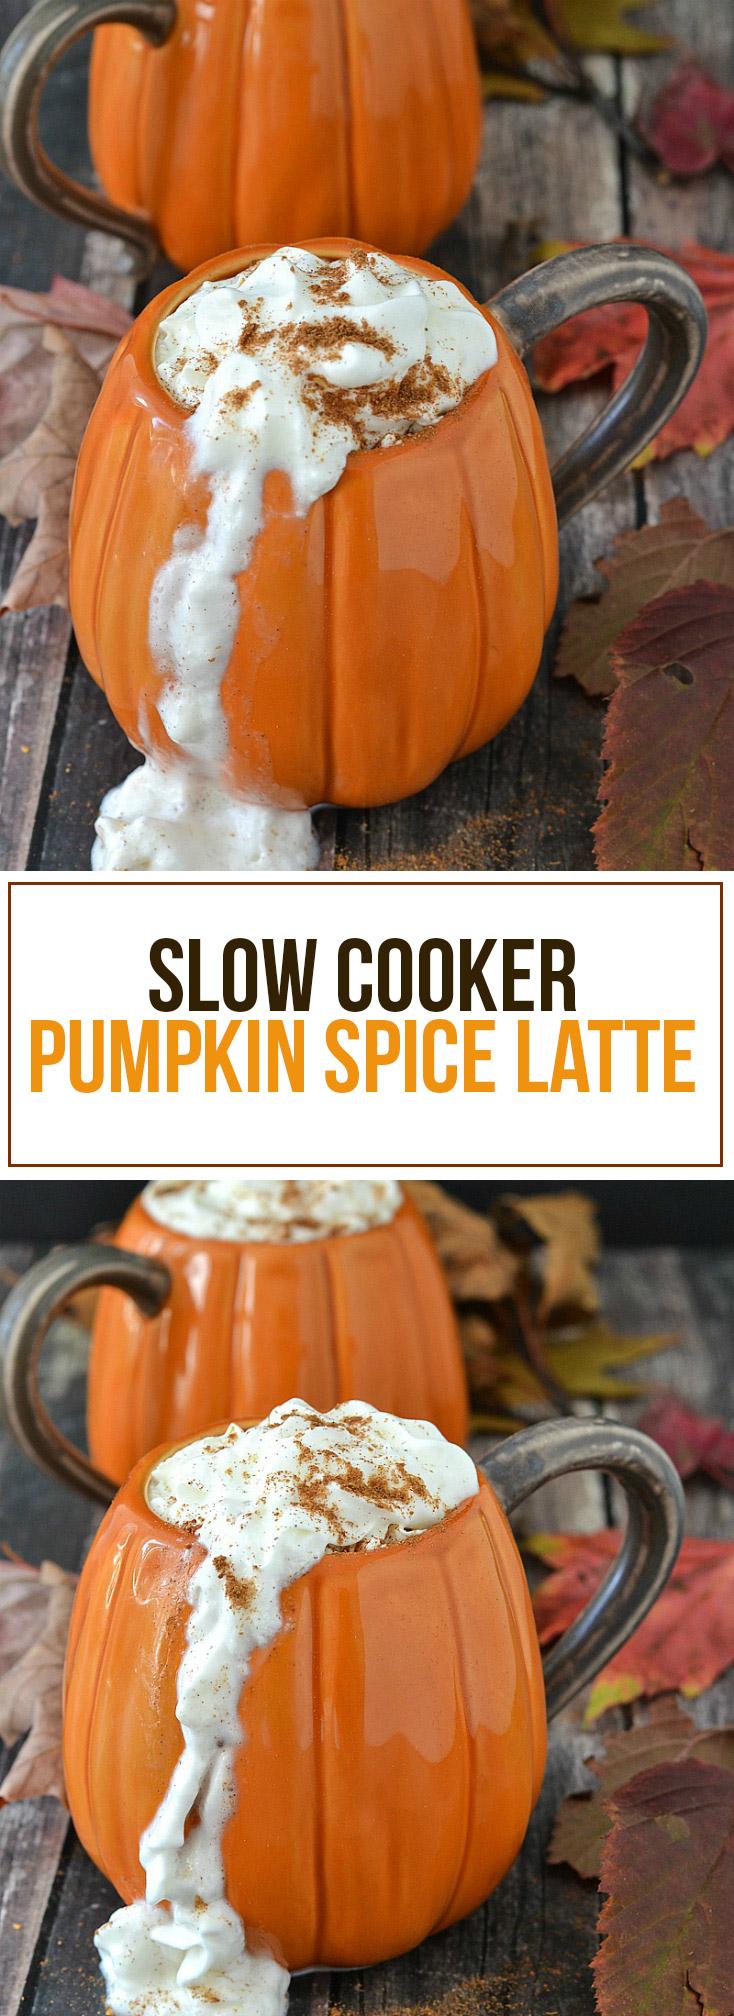 Slow Cooker Pumpkin Spice Latte - www.motherthyme.com